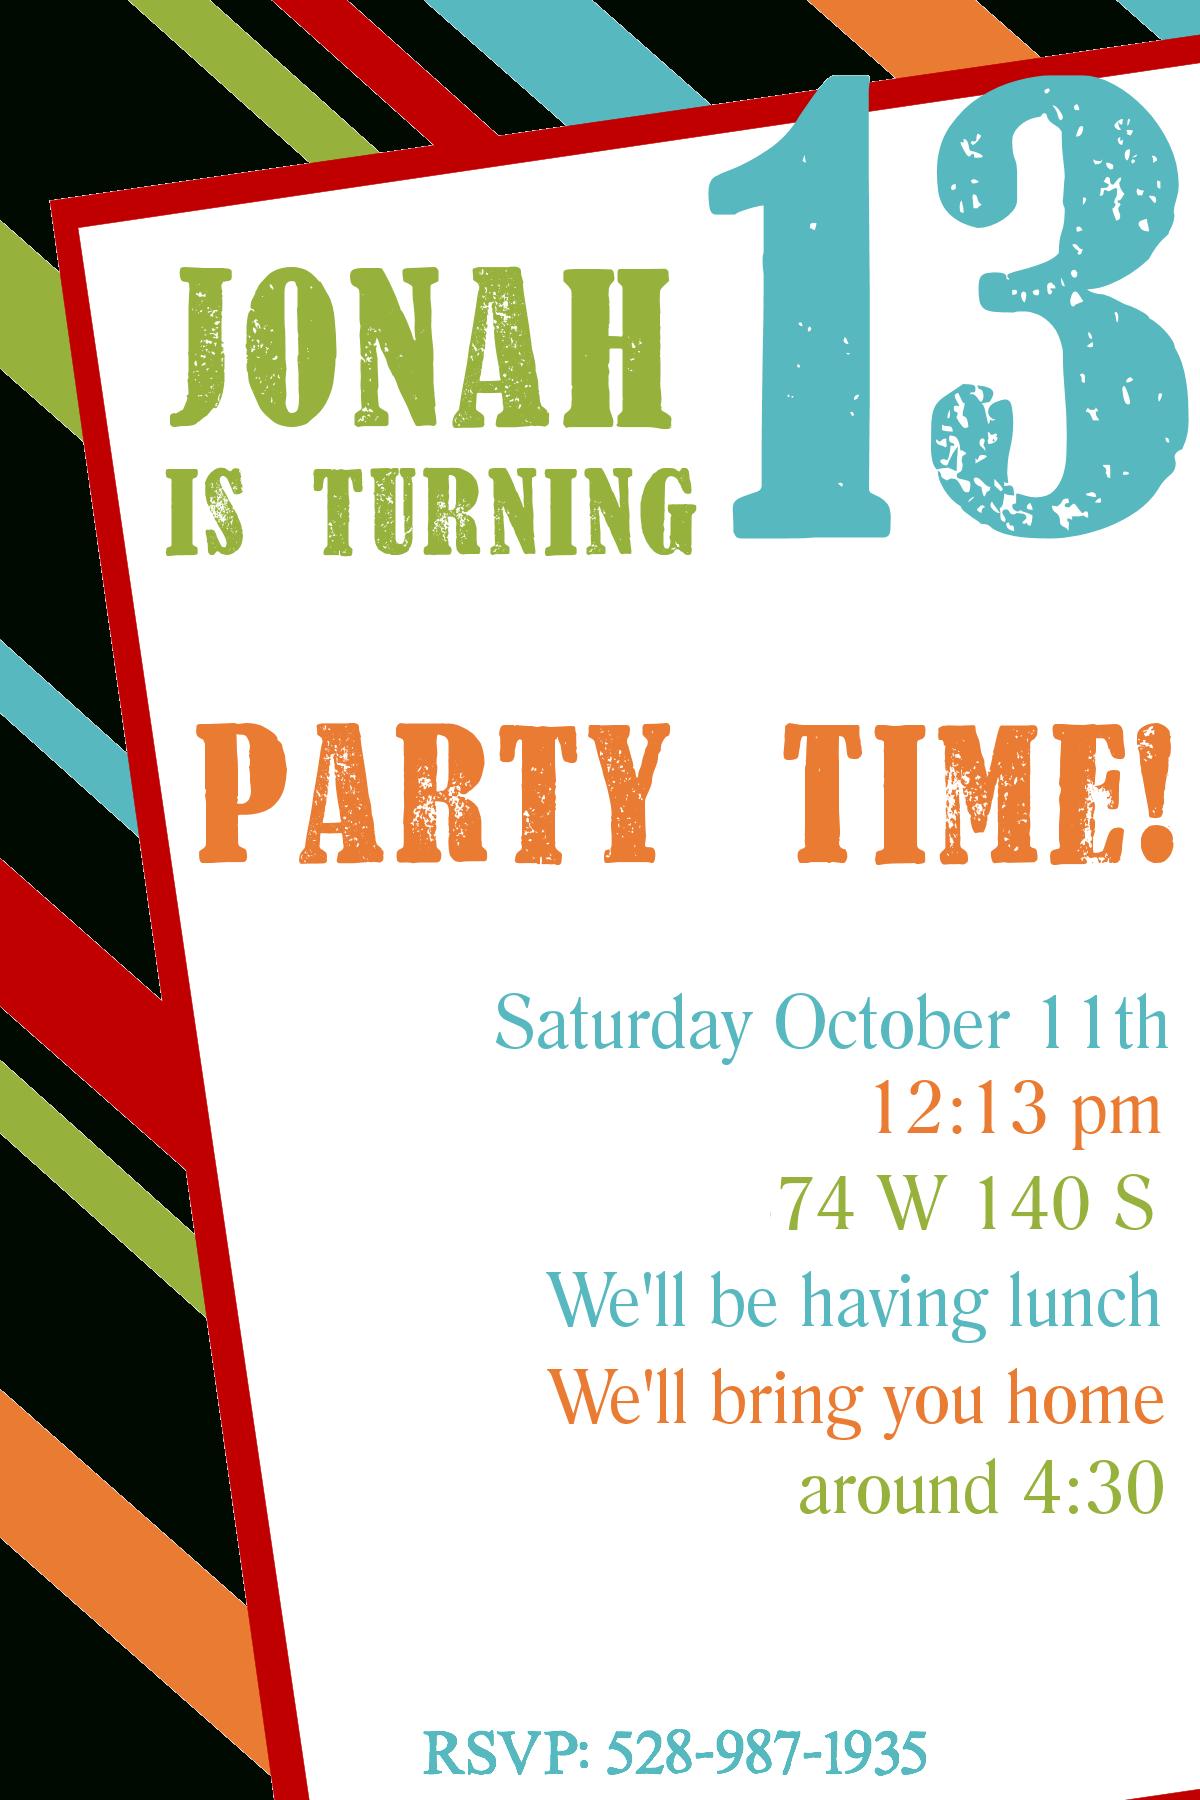 Free Printable Birthday Invitation Templates - Free Printable Birthday Party Flyers